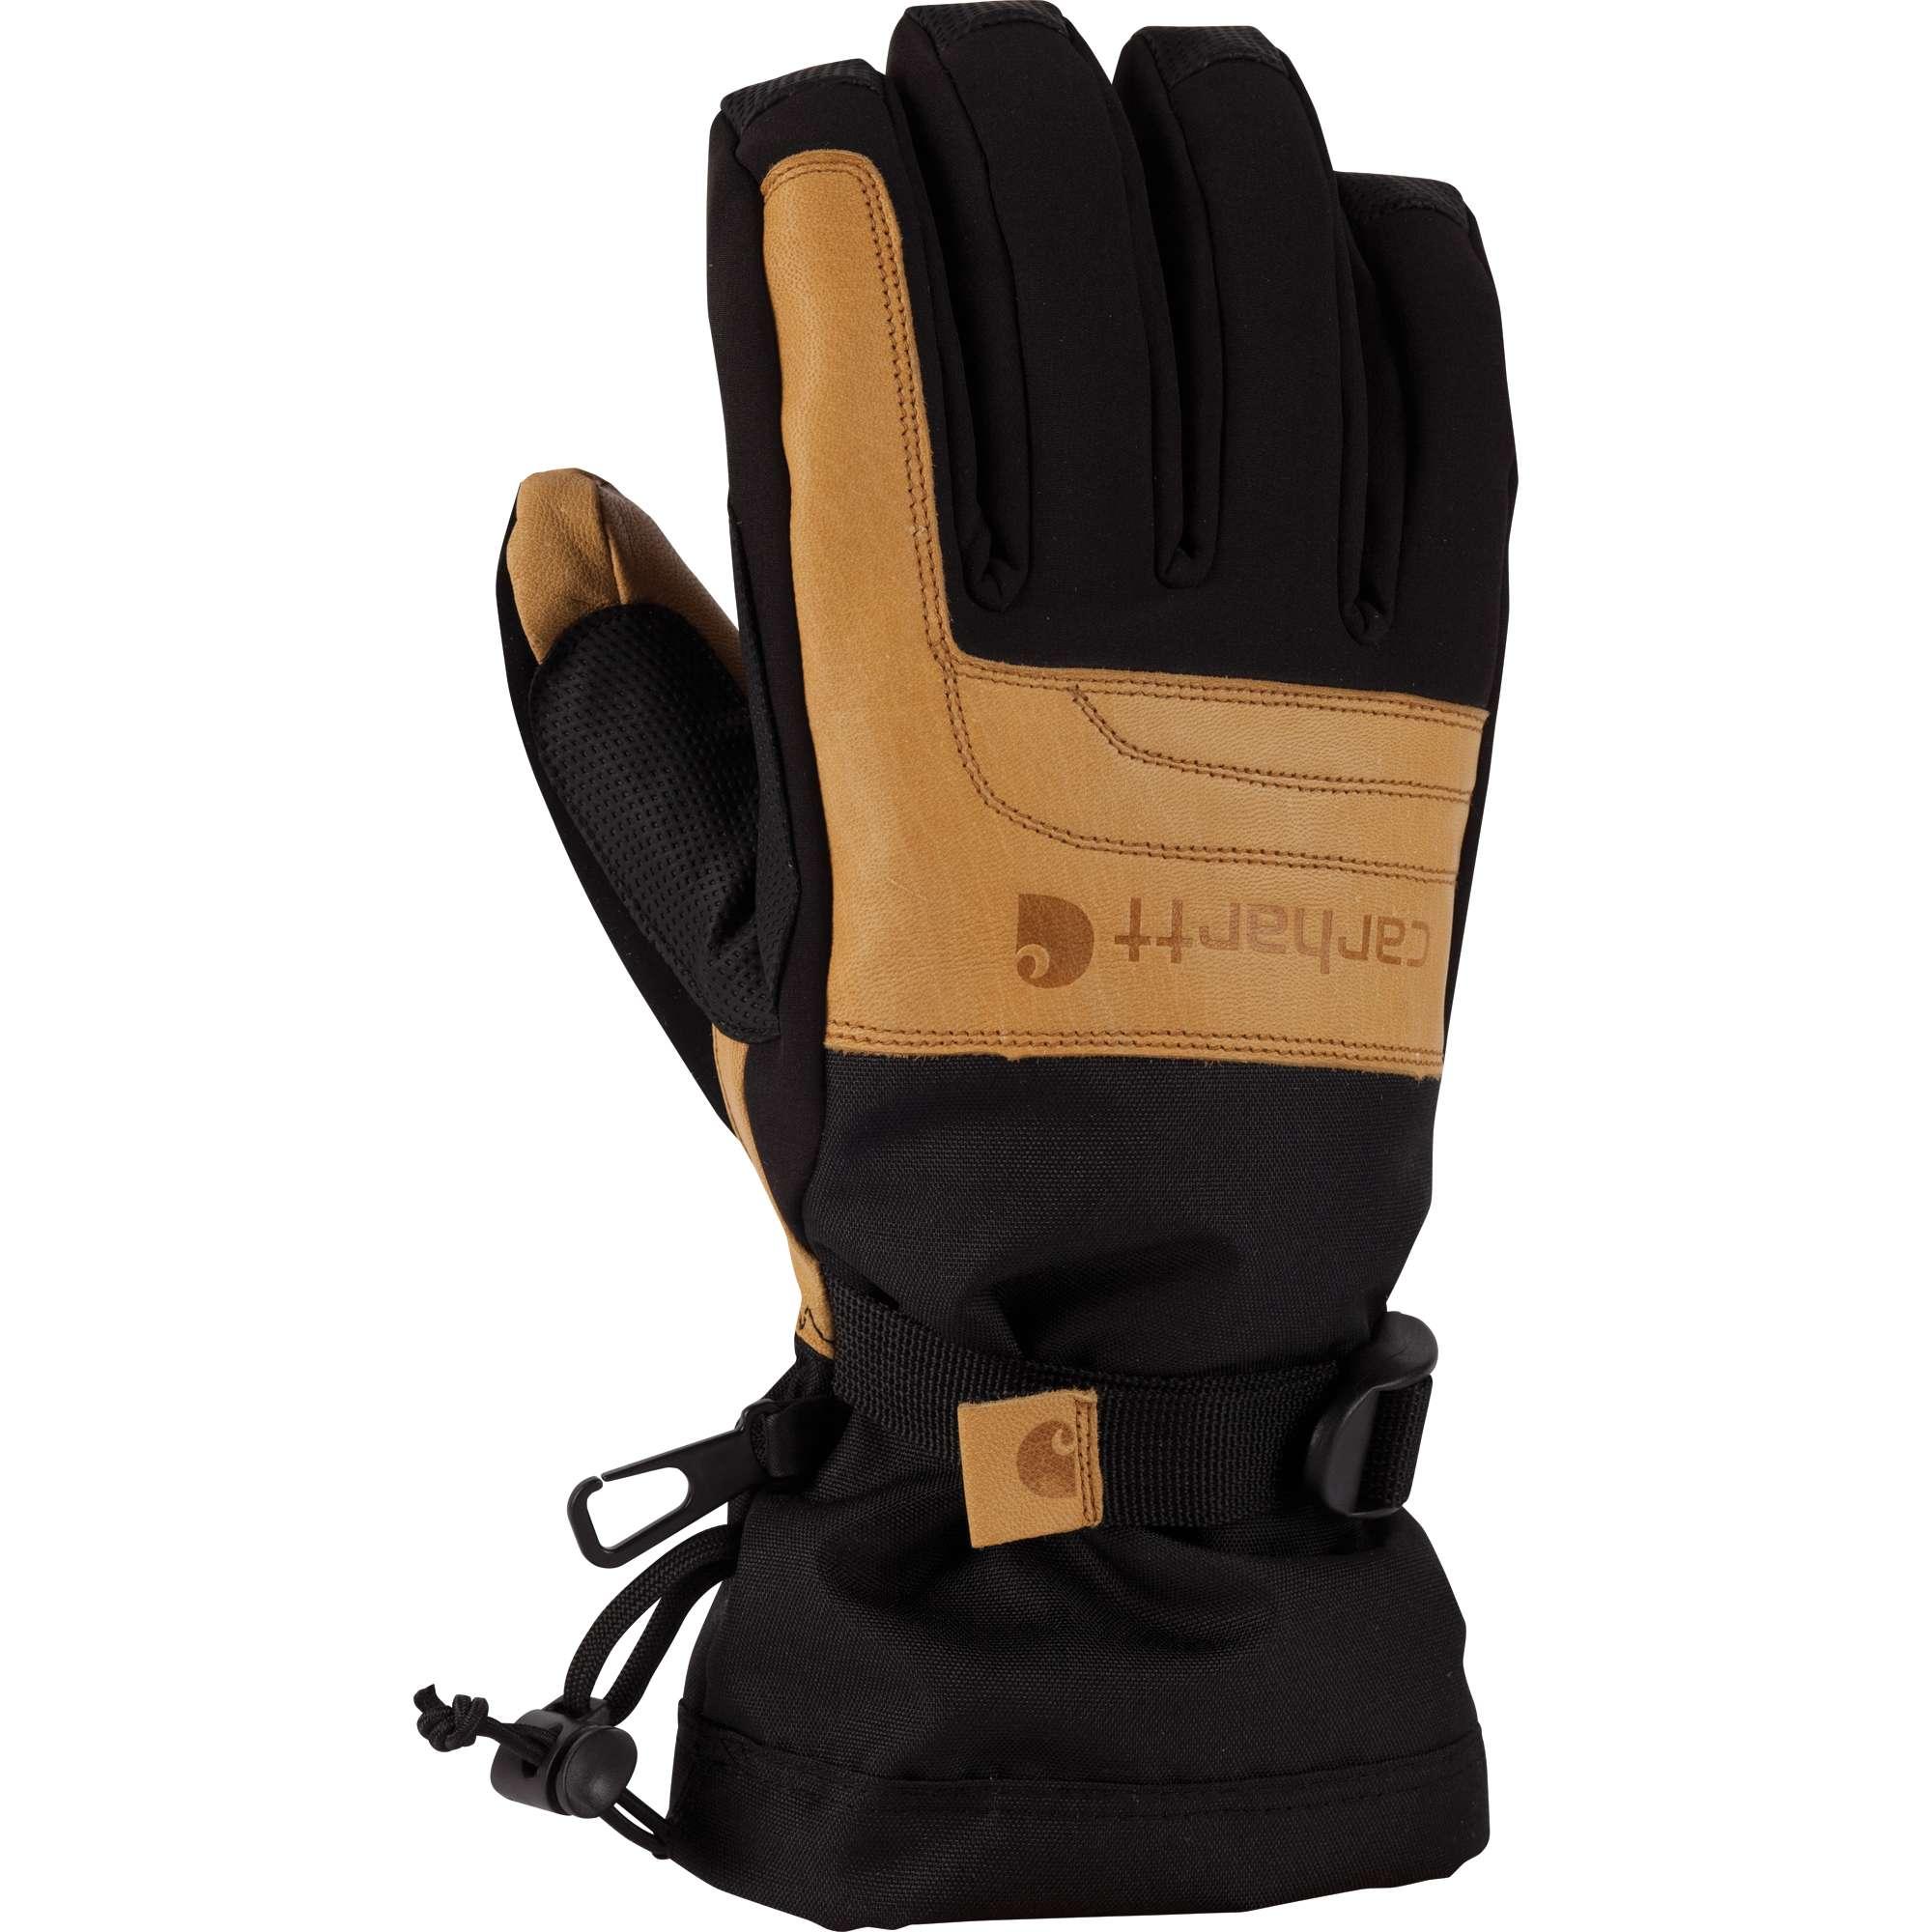 Carhartt Cold Snap Glove